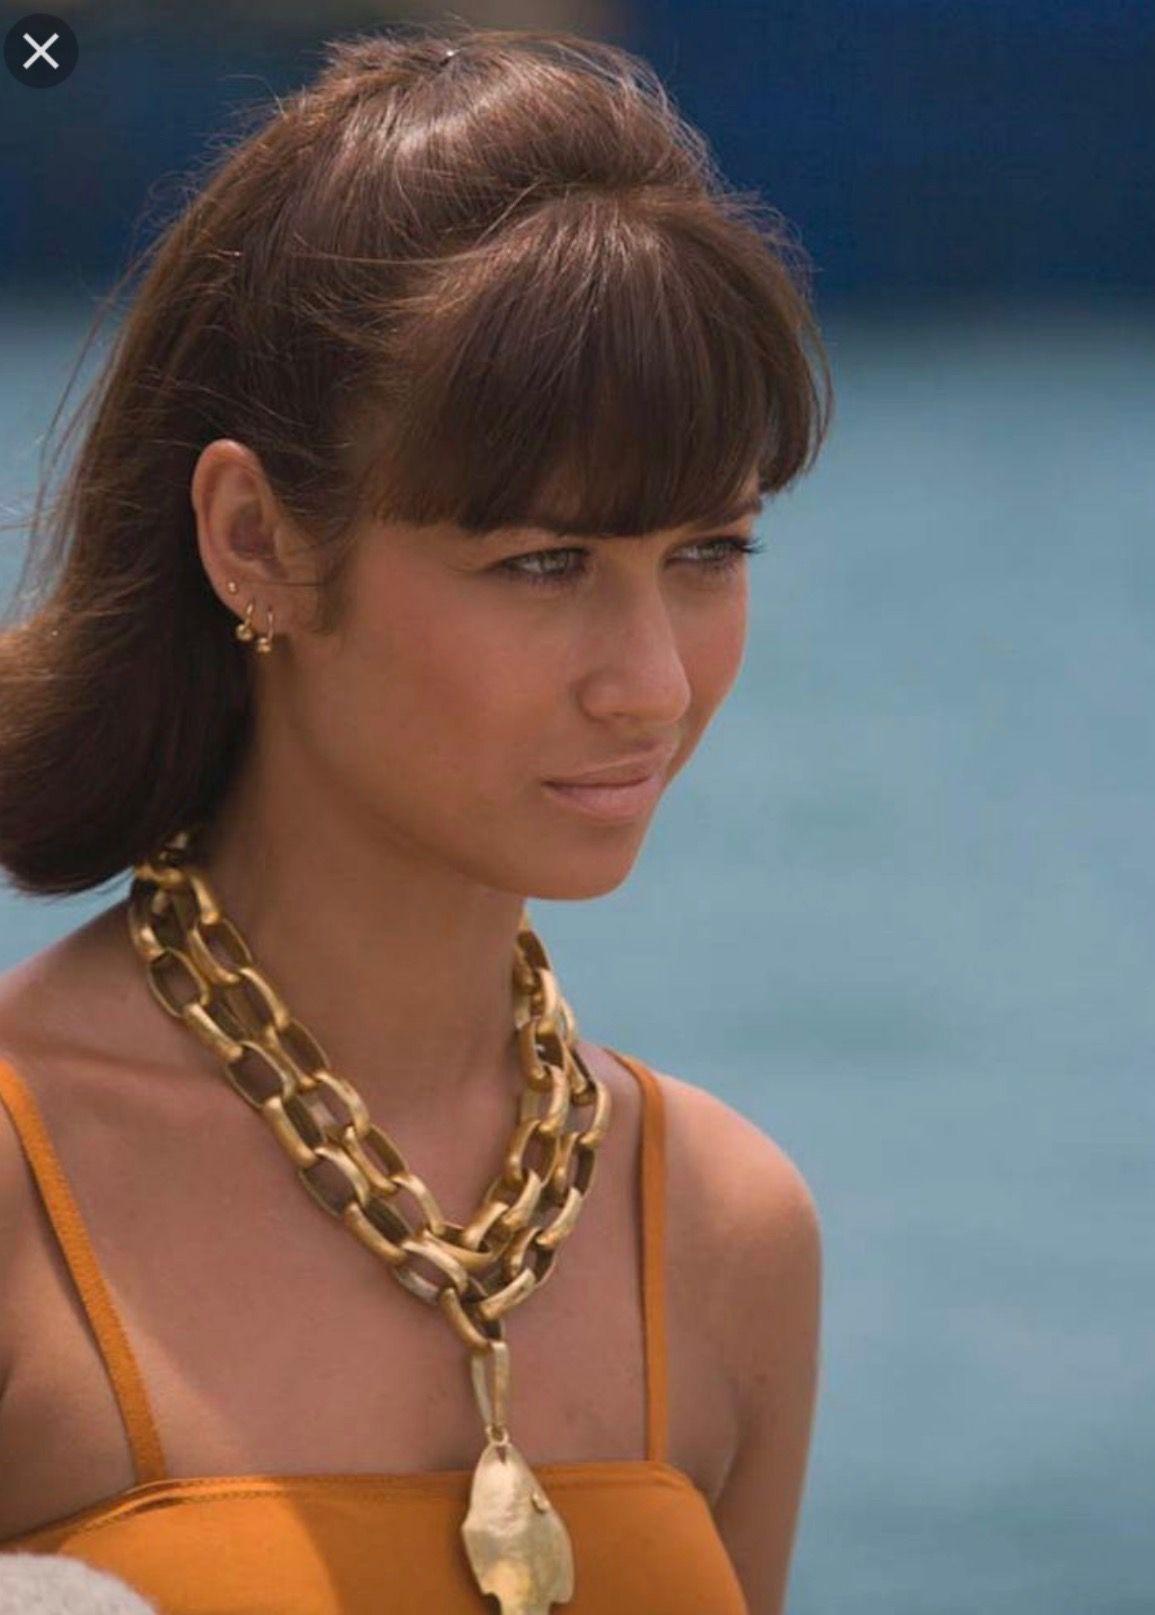 eed7fba94f Necklace worn by Olga Kurylenko as Camille Montes. Movie: Quantum of ...